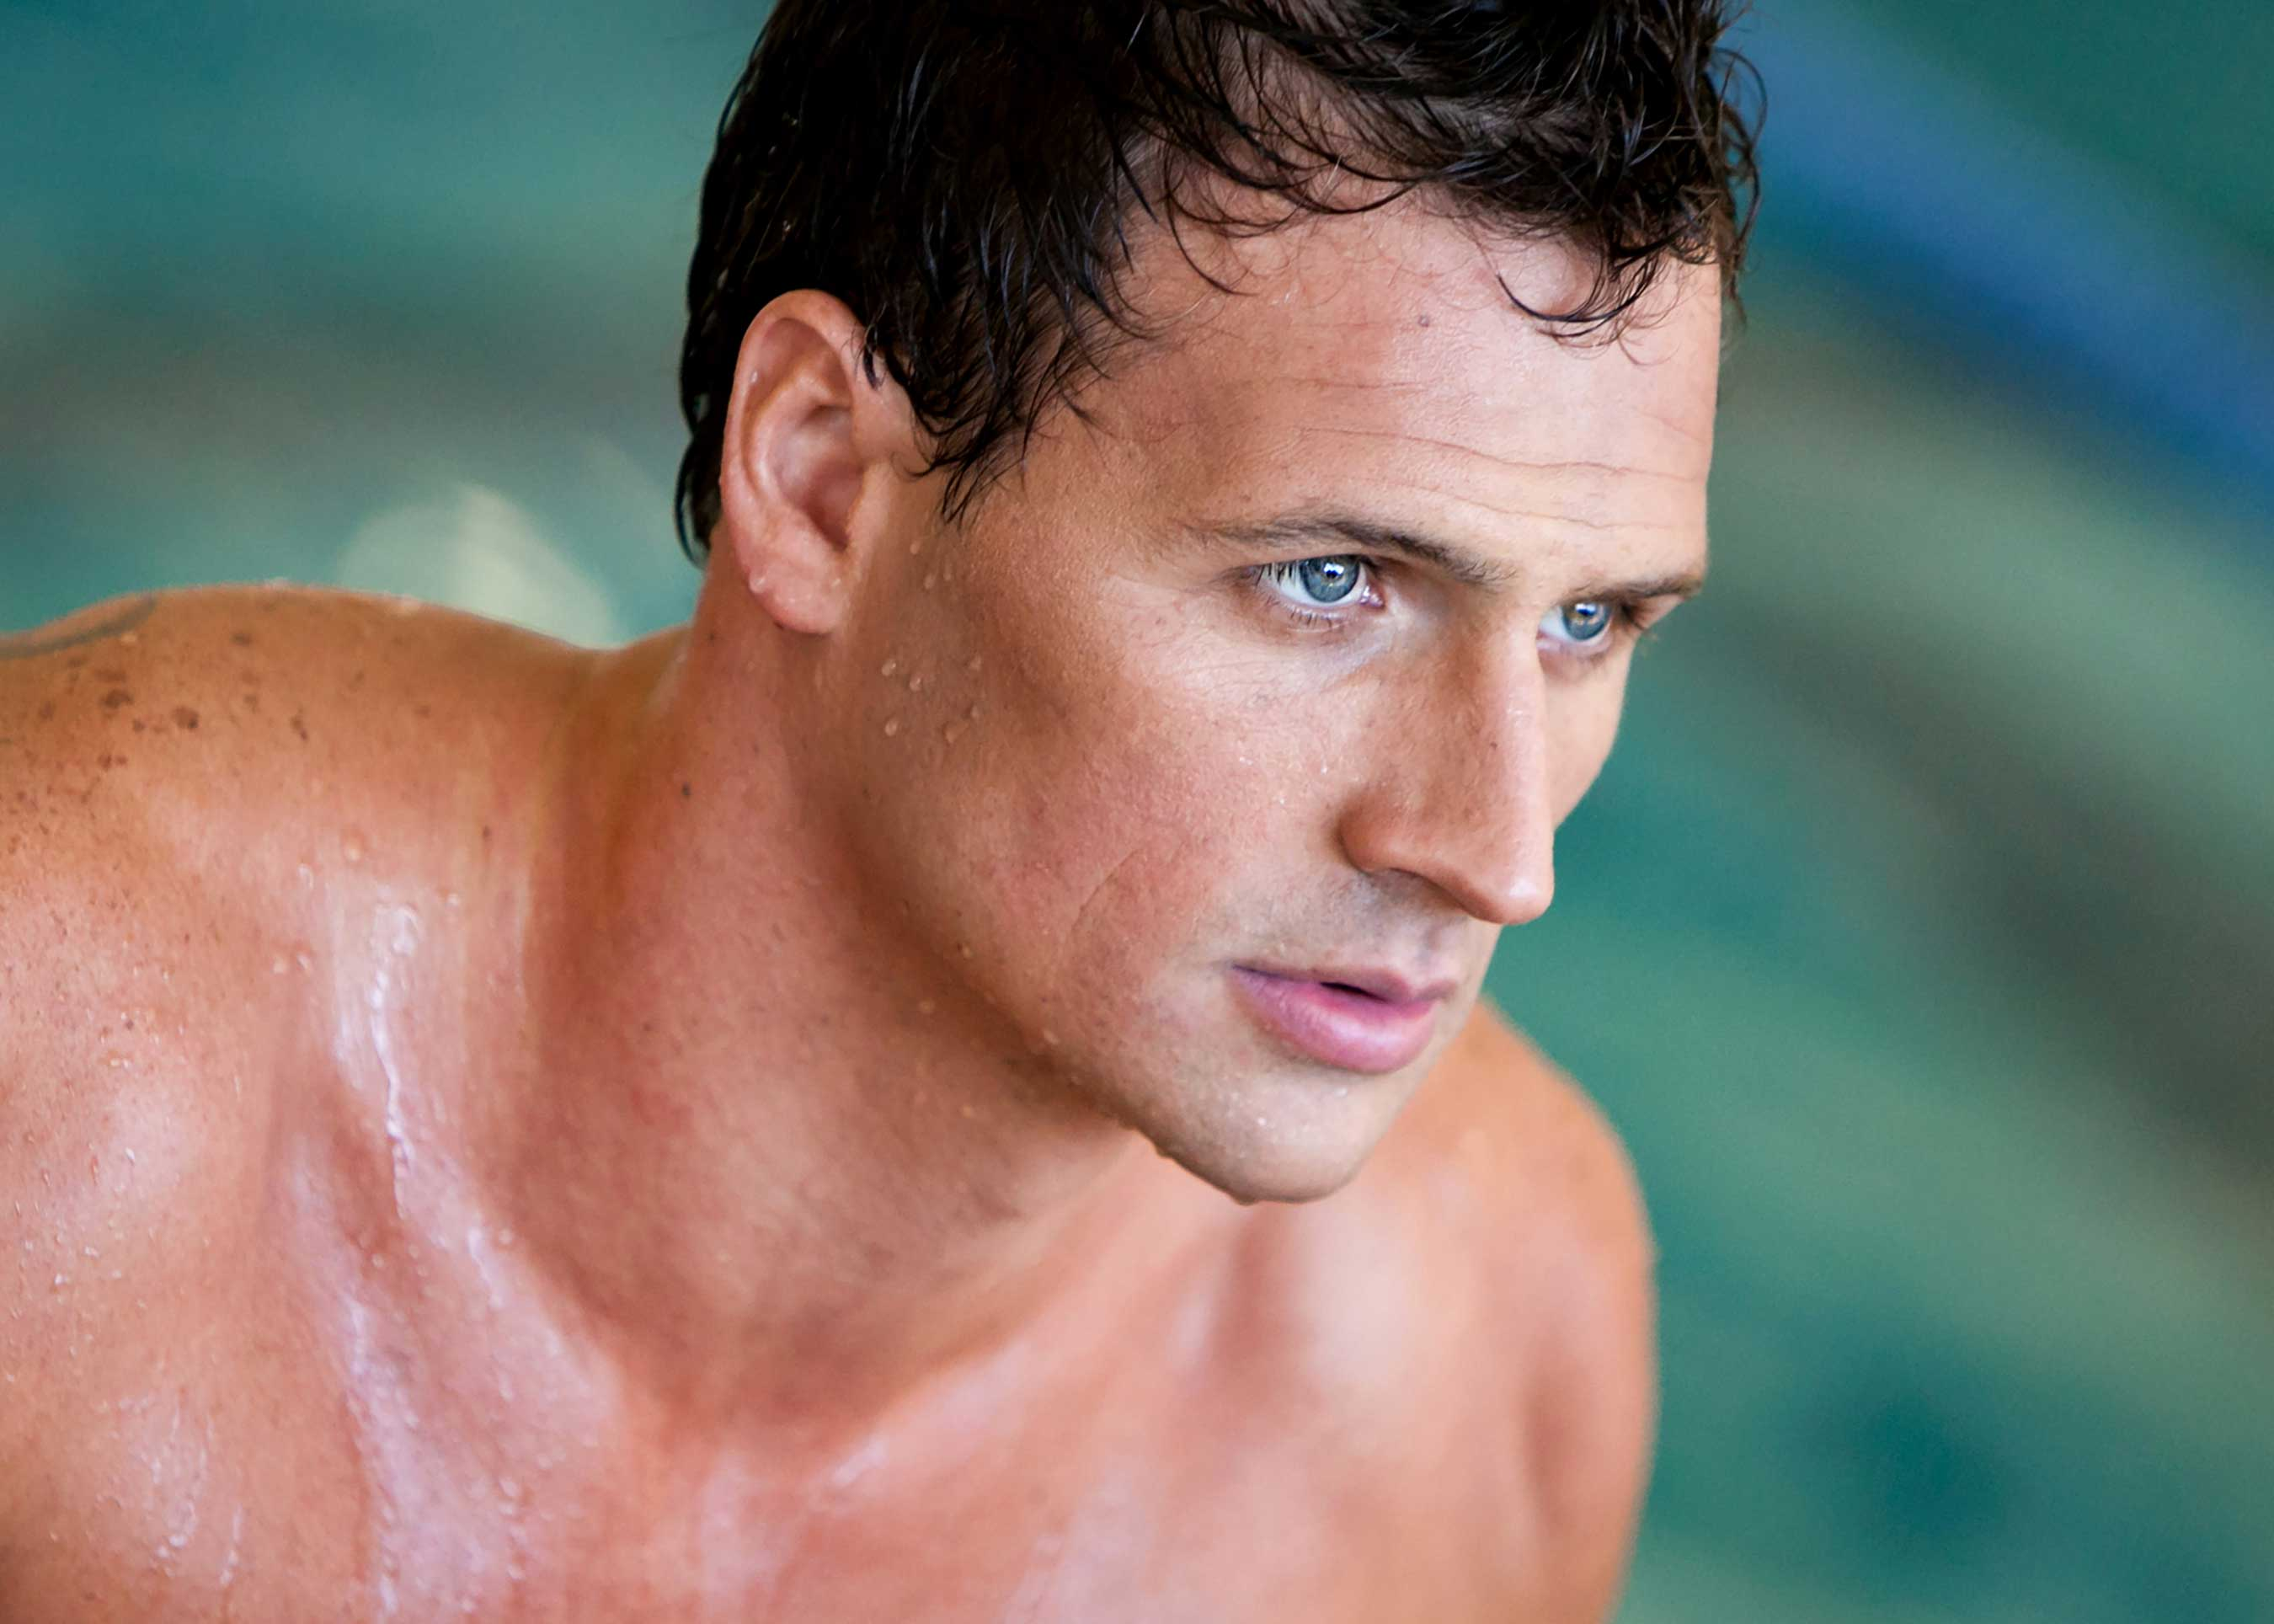 World Champion Swimmer Ryan Lochte Puts down the Razor and Picks up ...